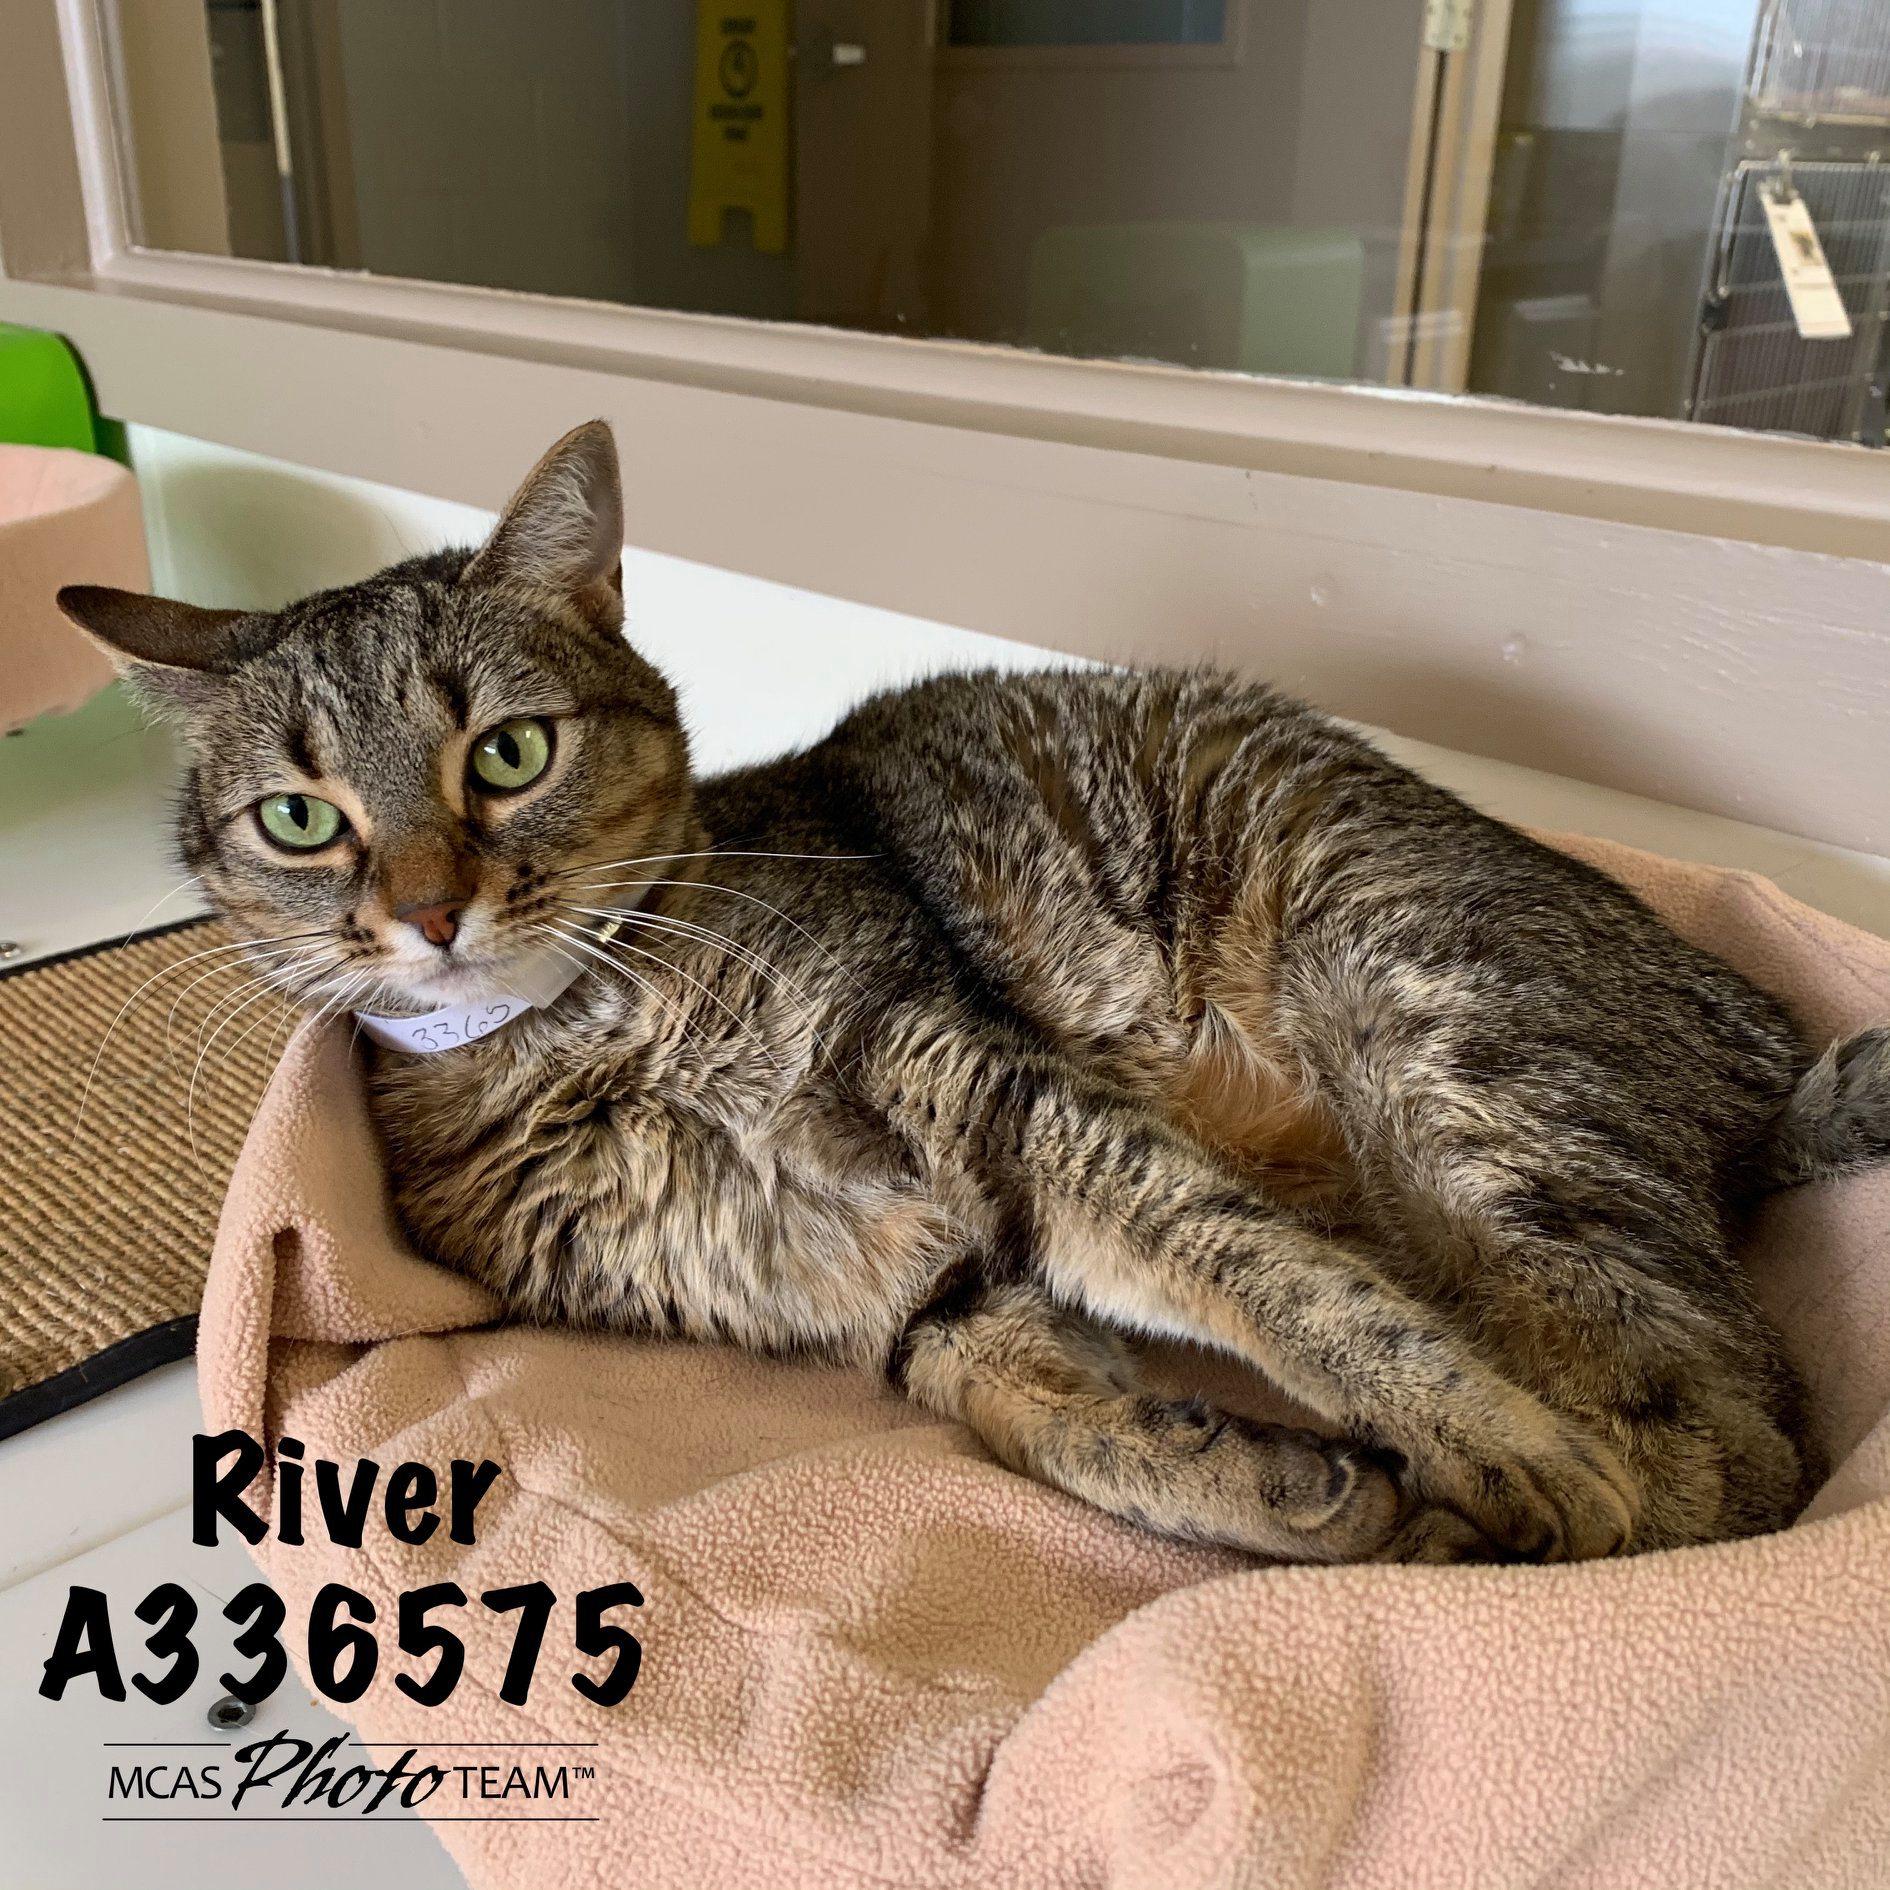 River, ID: A336575